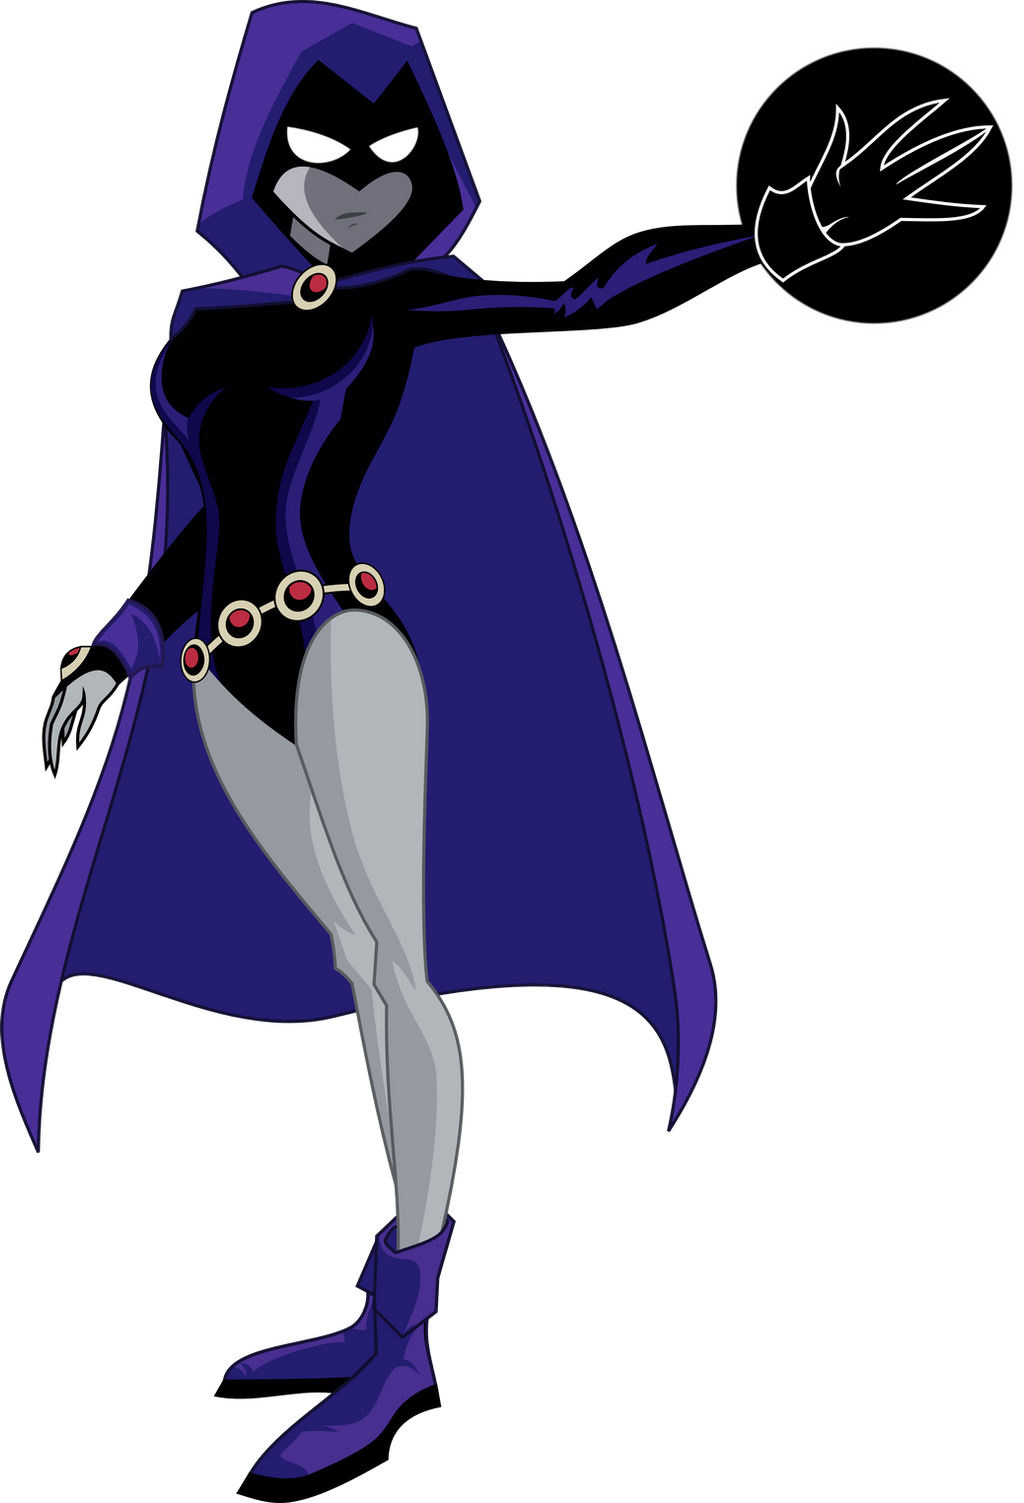 Teen Titans Raven by The-Raven-Club on DeviantArt